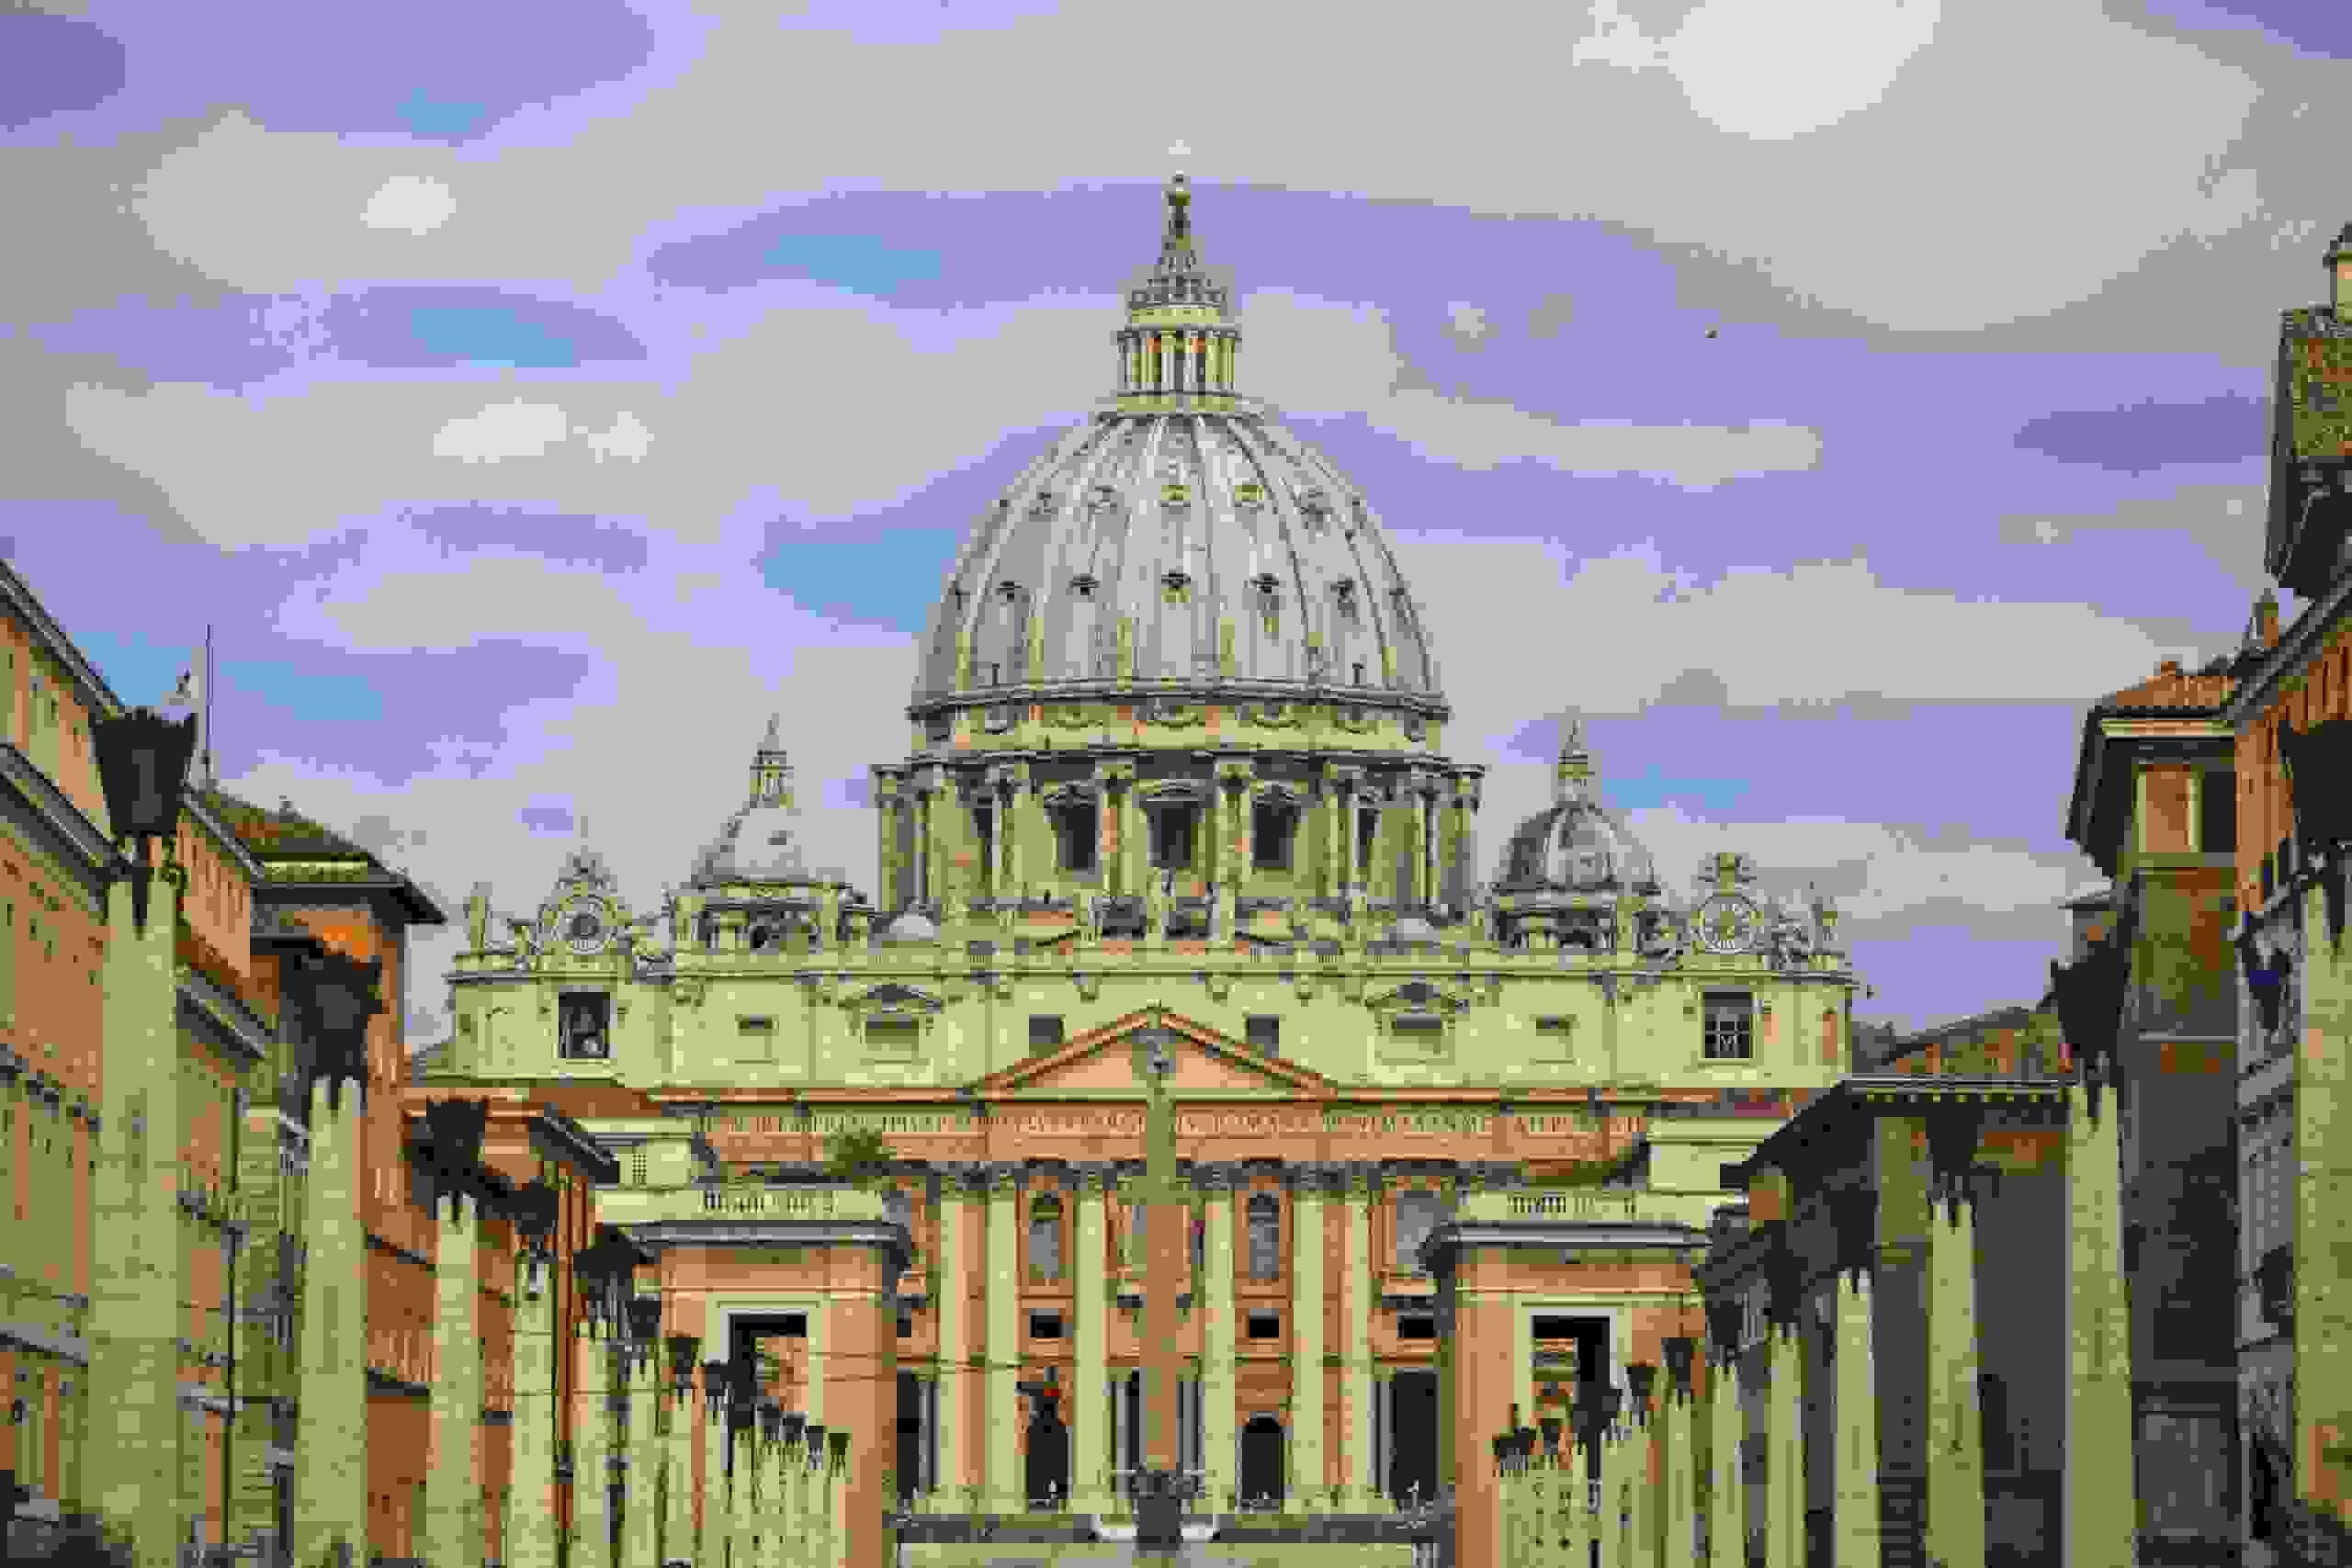 St. Peter's Basilica | Source: usatoday.com